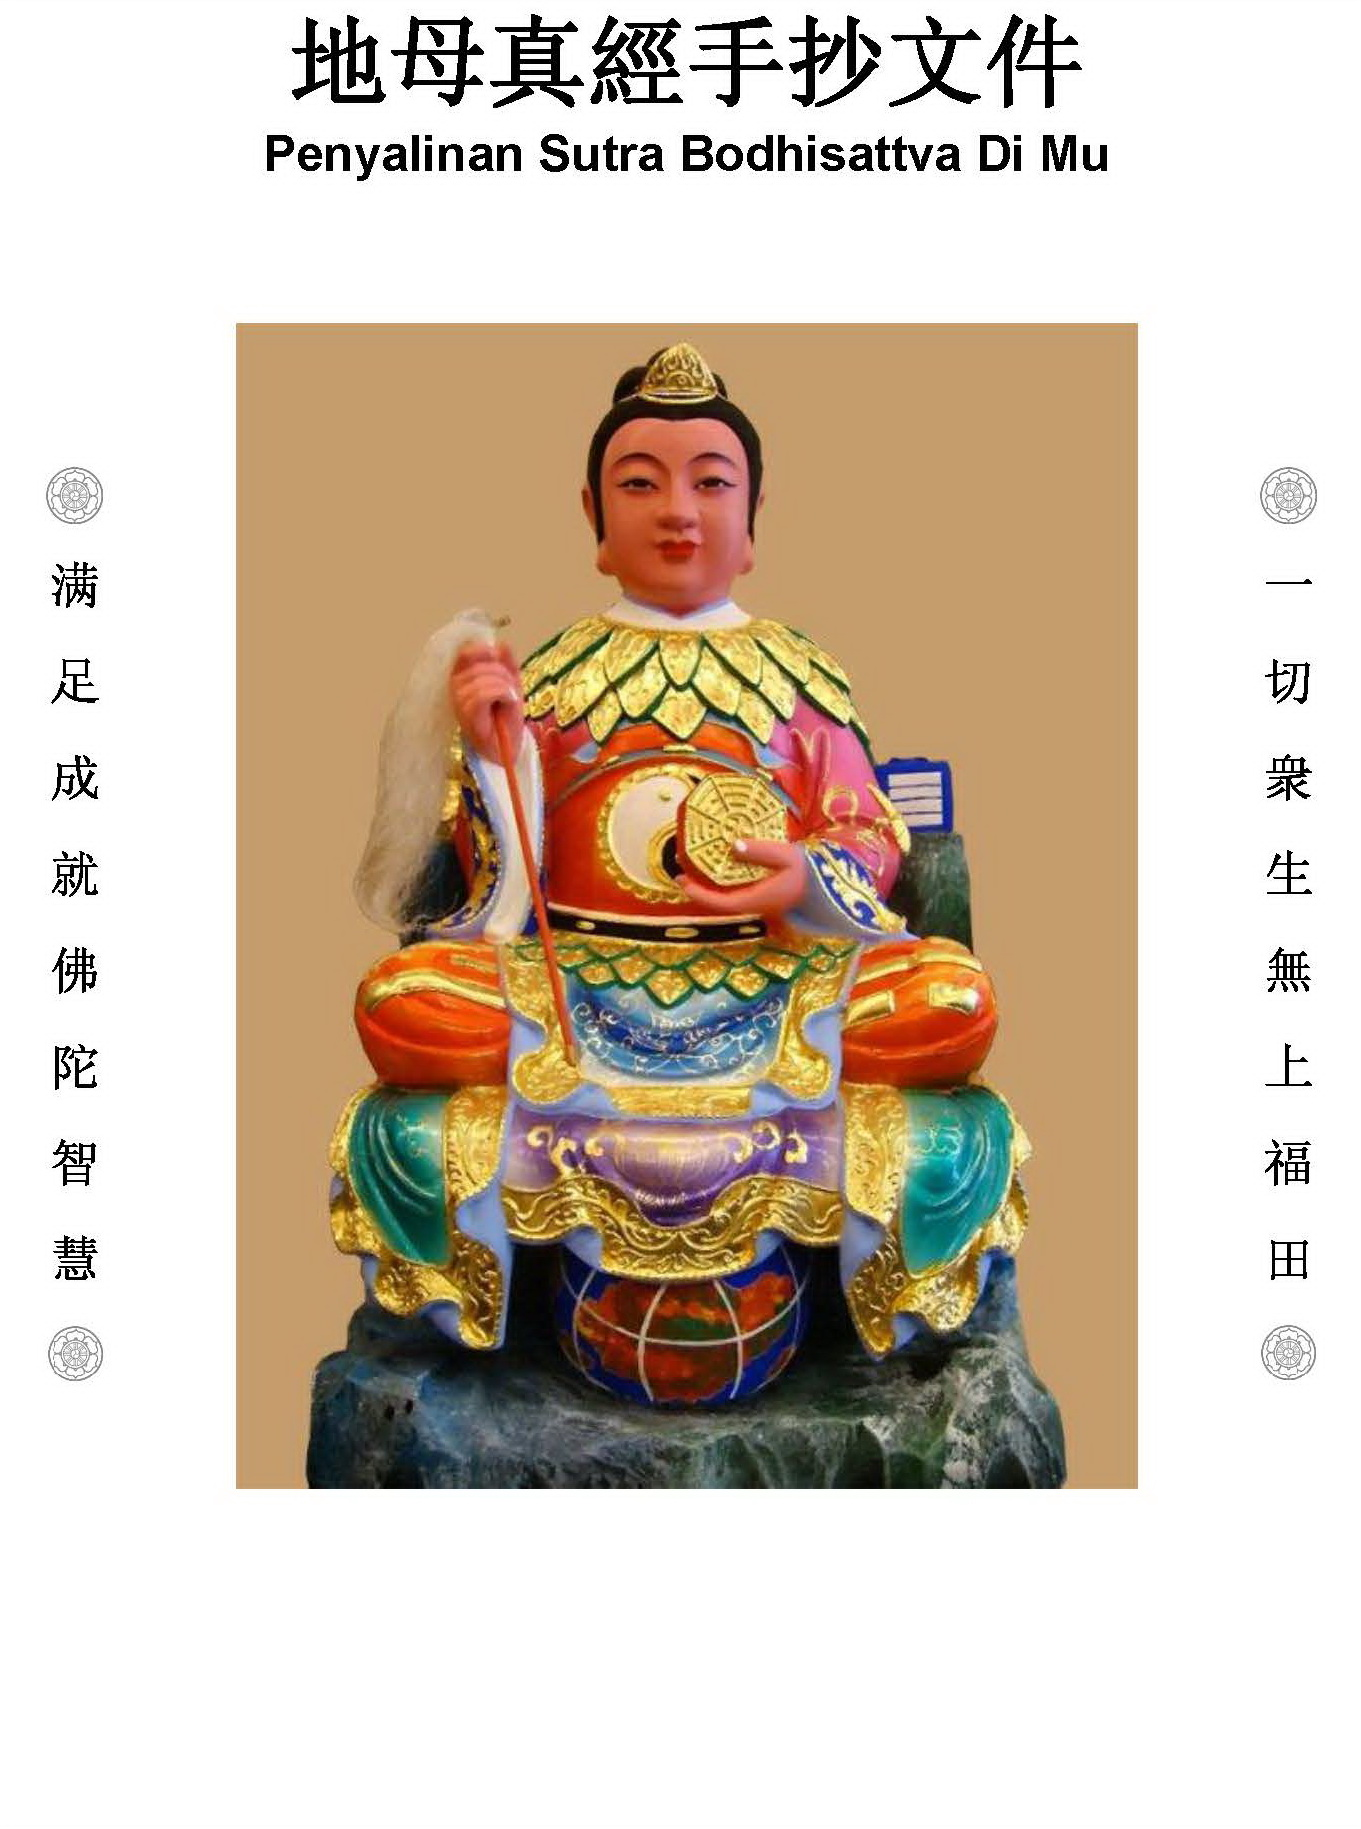 salin sutra bodhisattva dimu Penyalinan Sutra